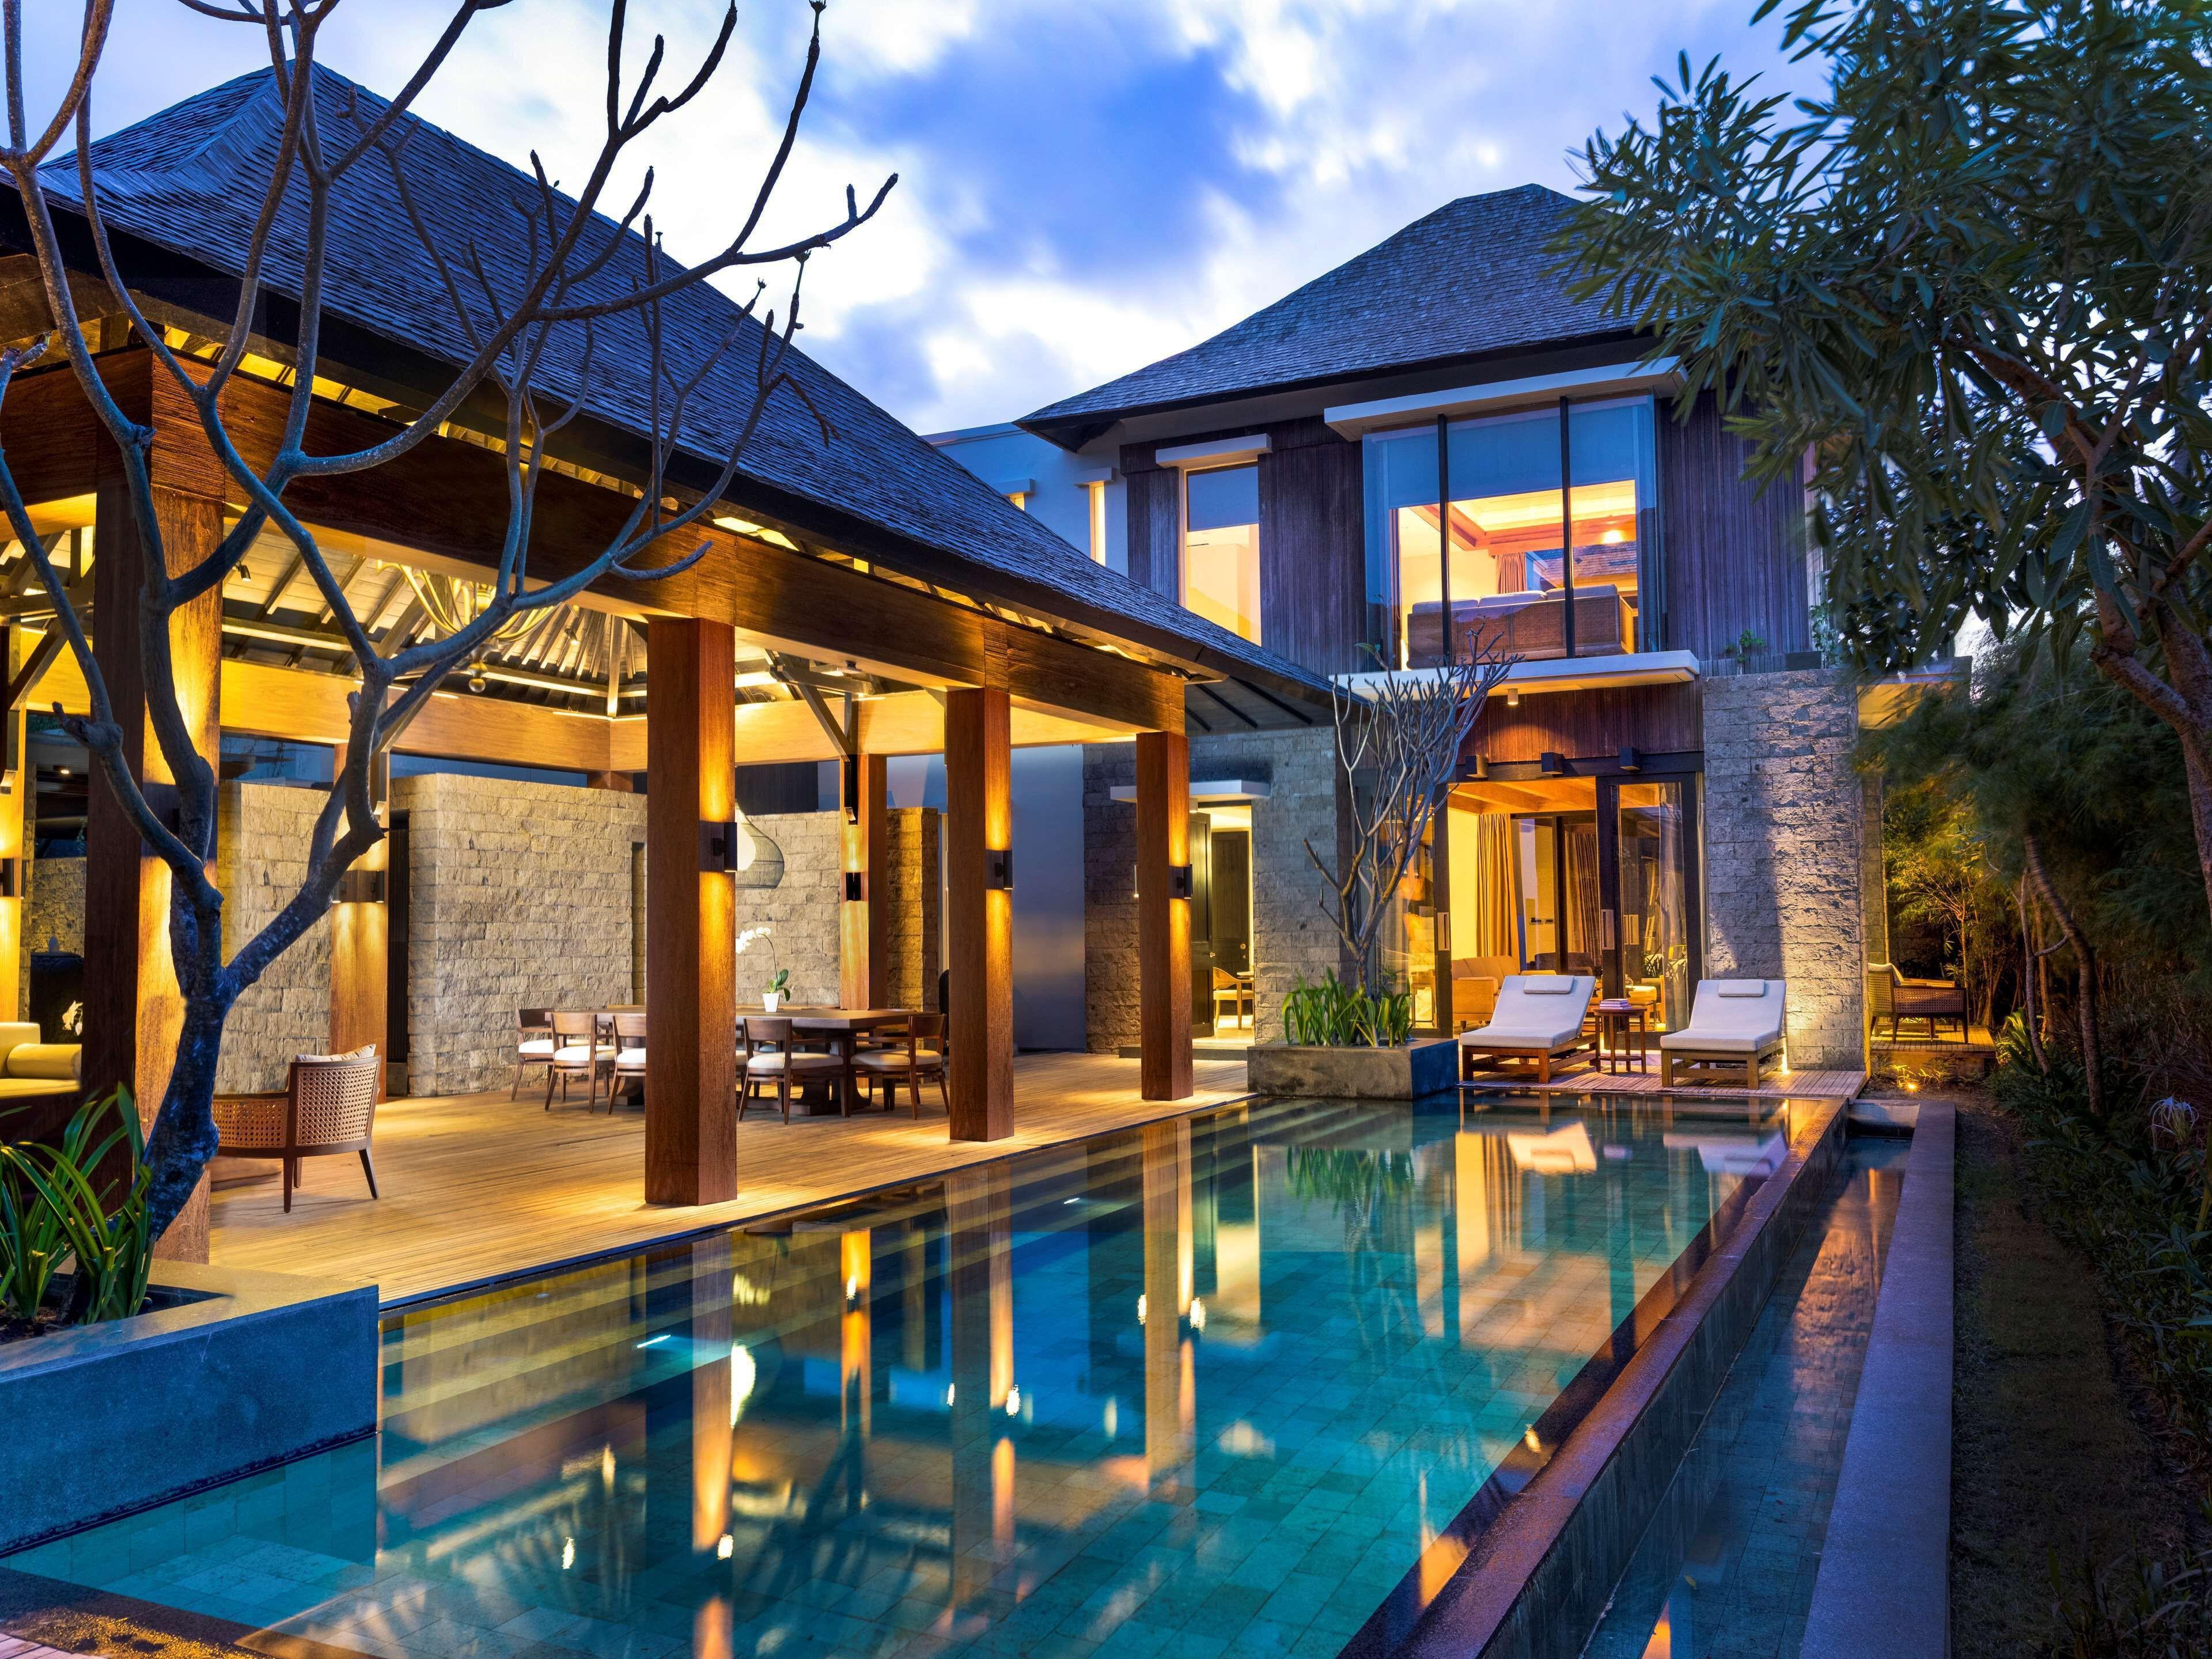 Courtesy of The Apurva Kempinski Bali / Expedia.com